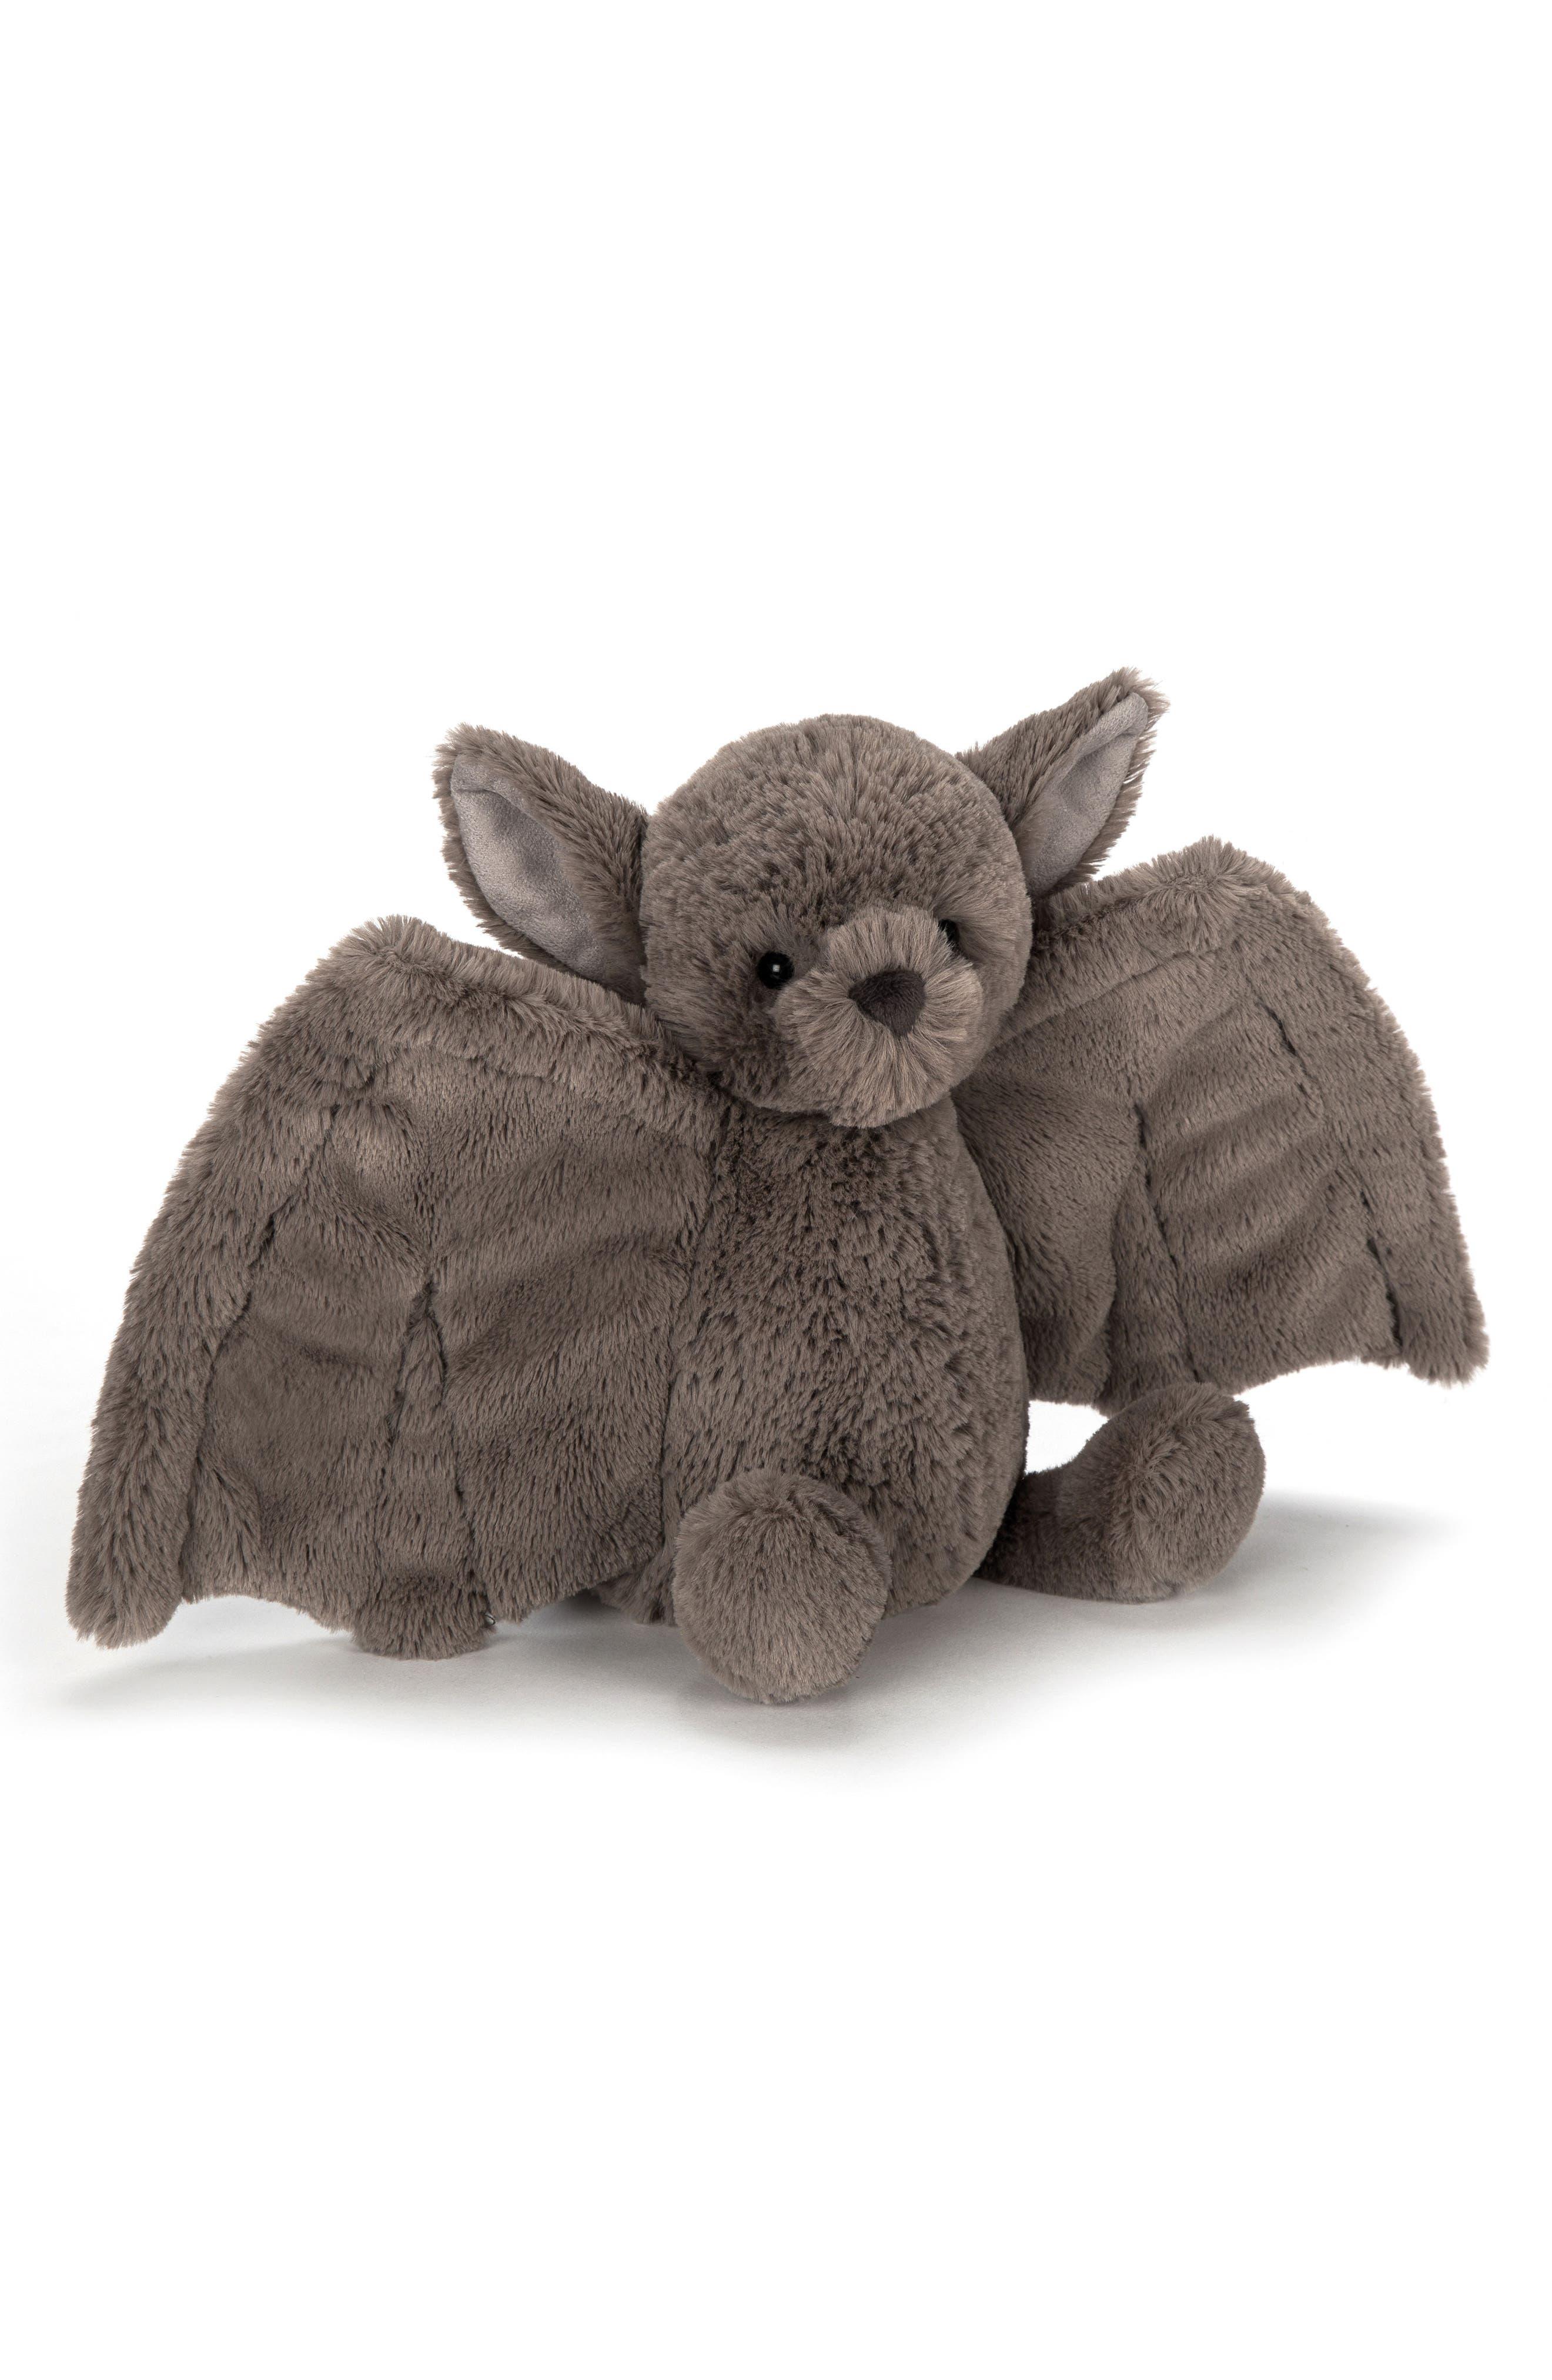 Medium Bashful Bat Stuffed Animal,                             Main thumbnail 1, color,                             200